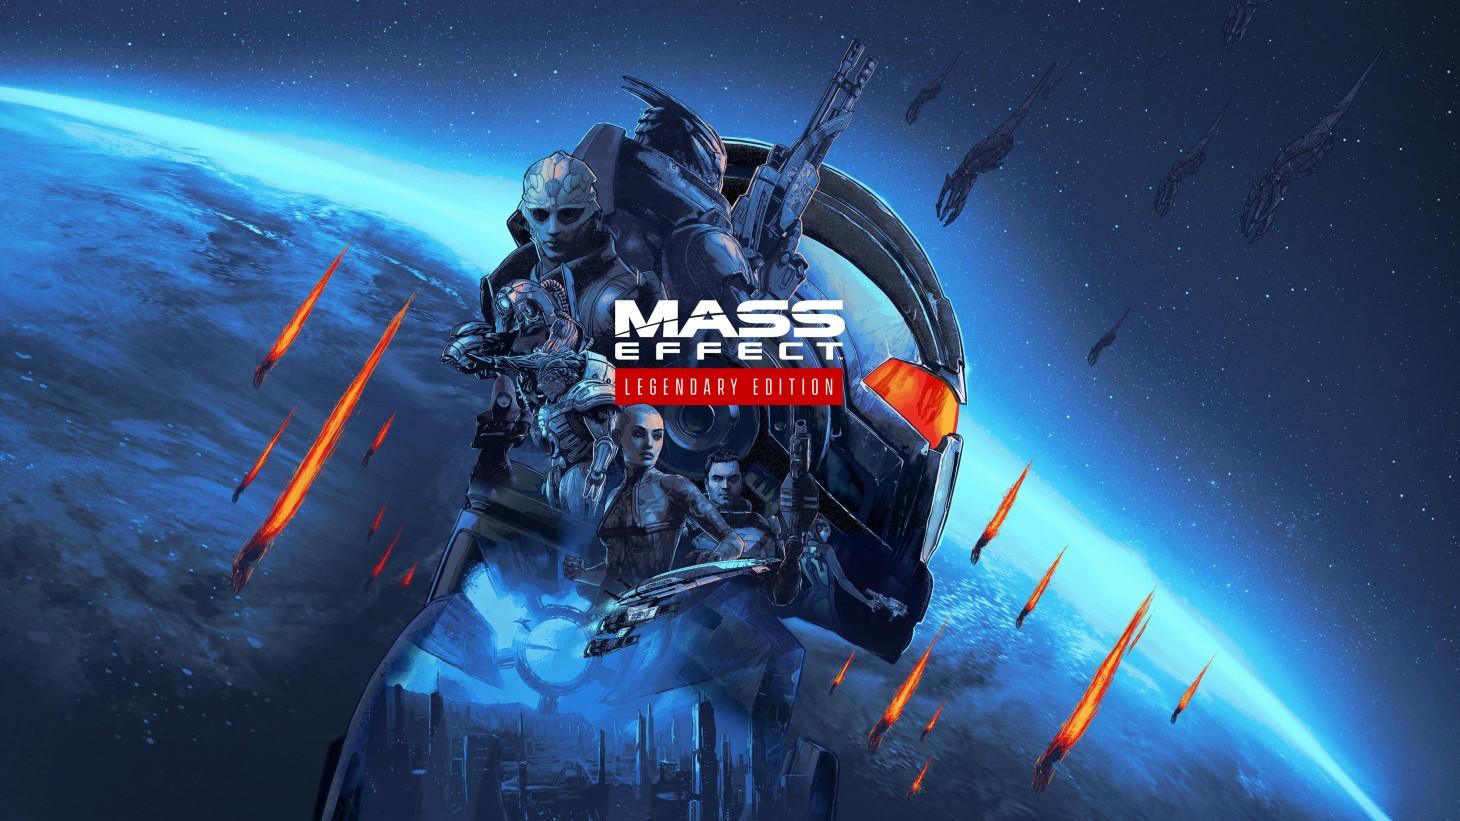 mass effect 1 colossus armor